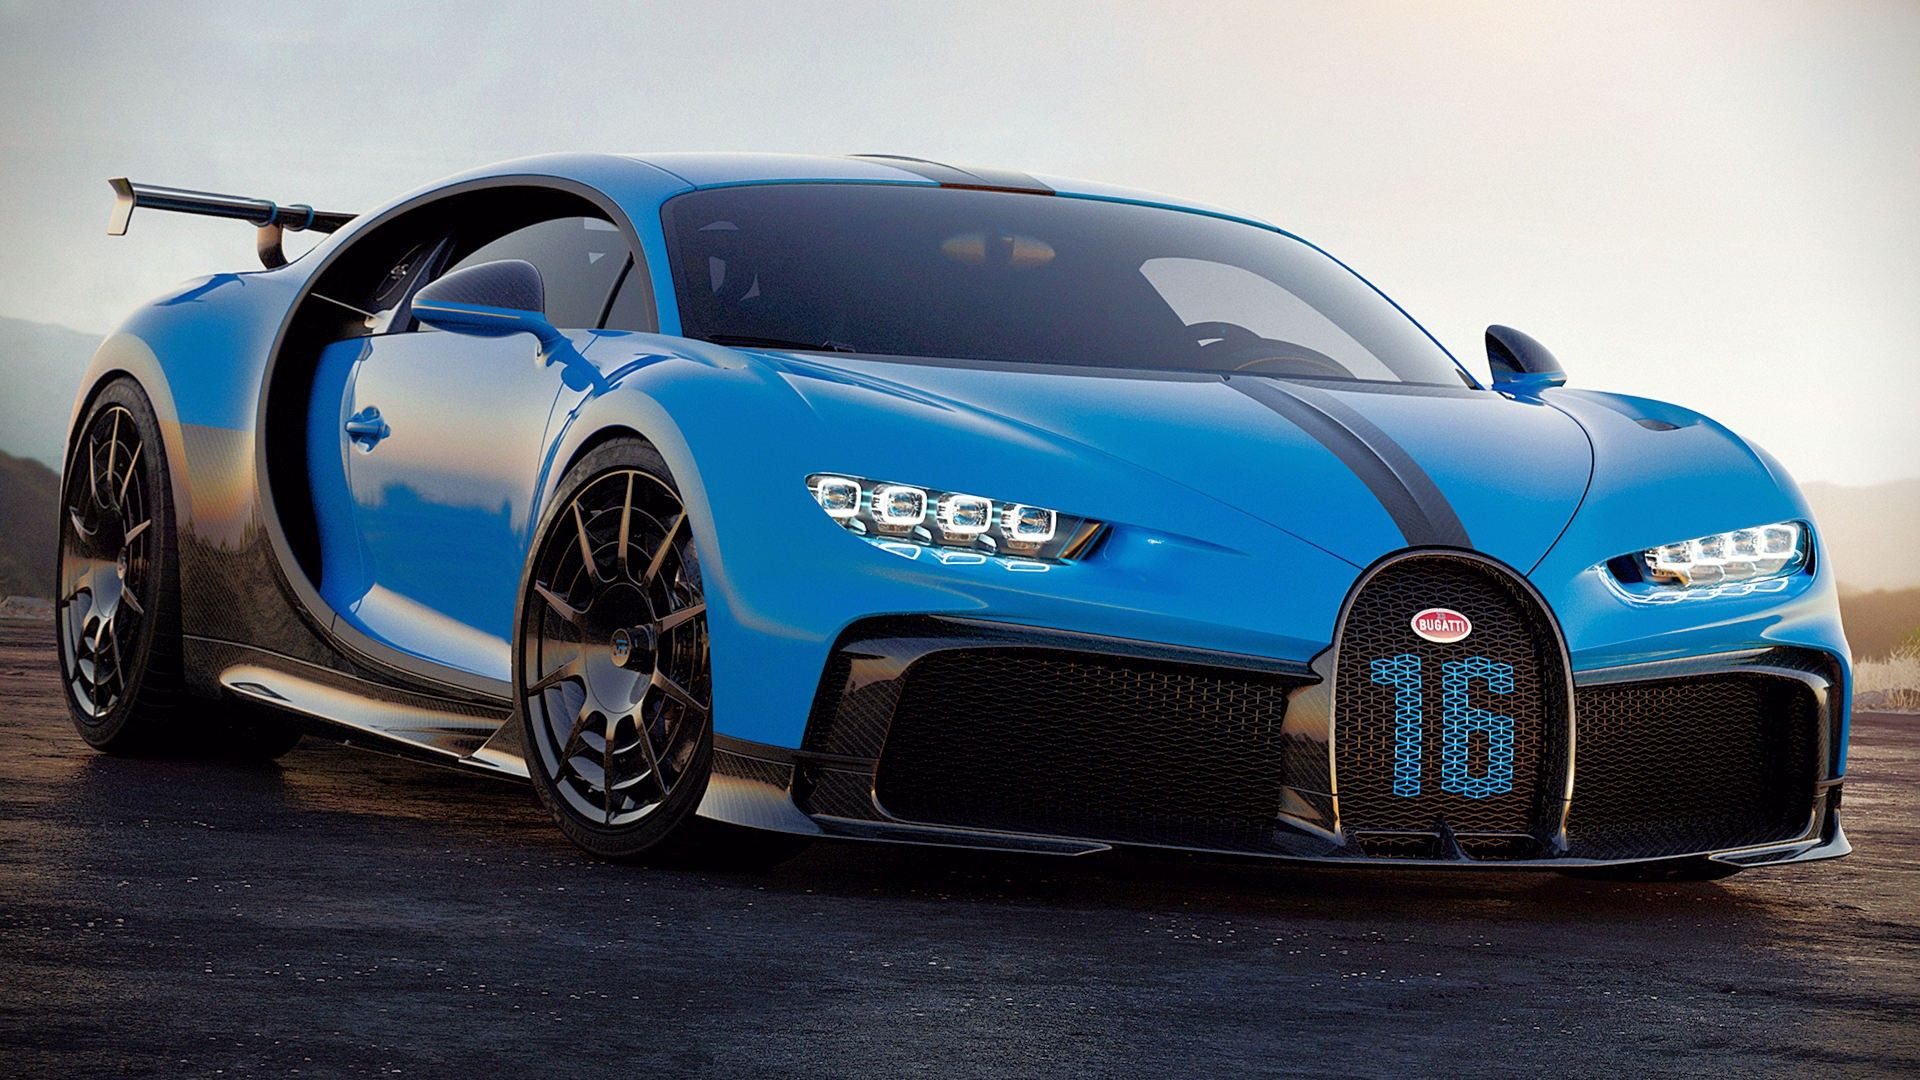 Pin By Zephyr On Ahyper Car Bugatti Cars Bugatti Chiron Super Cars